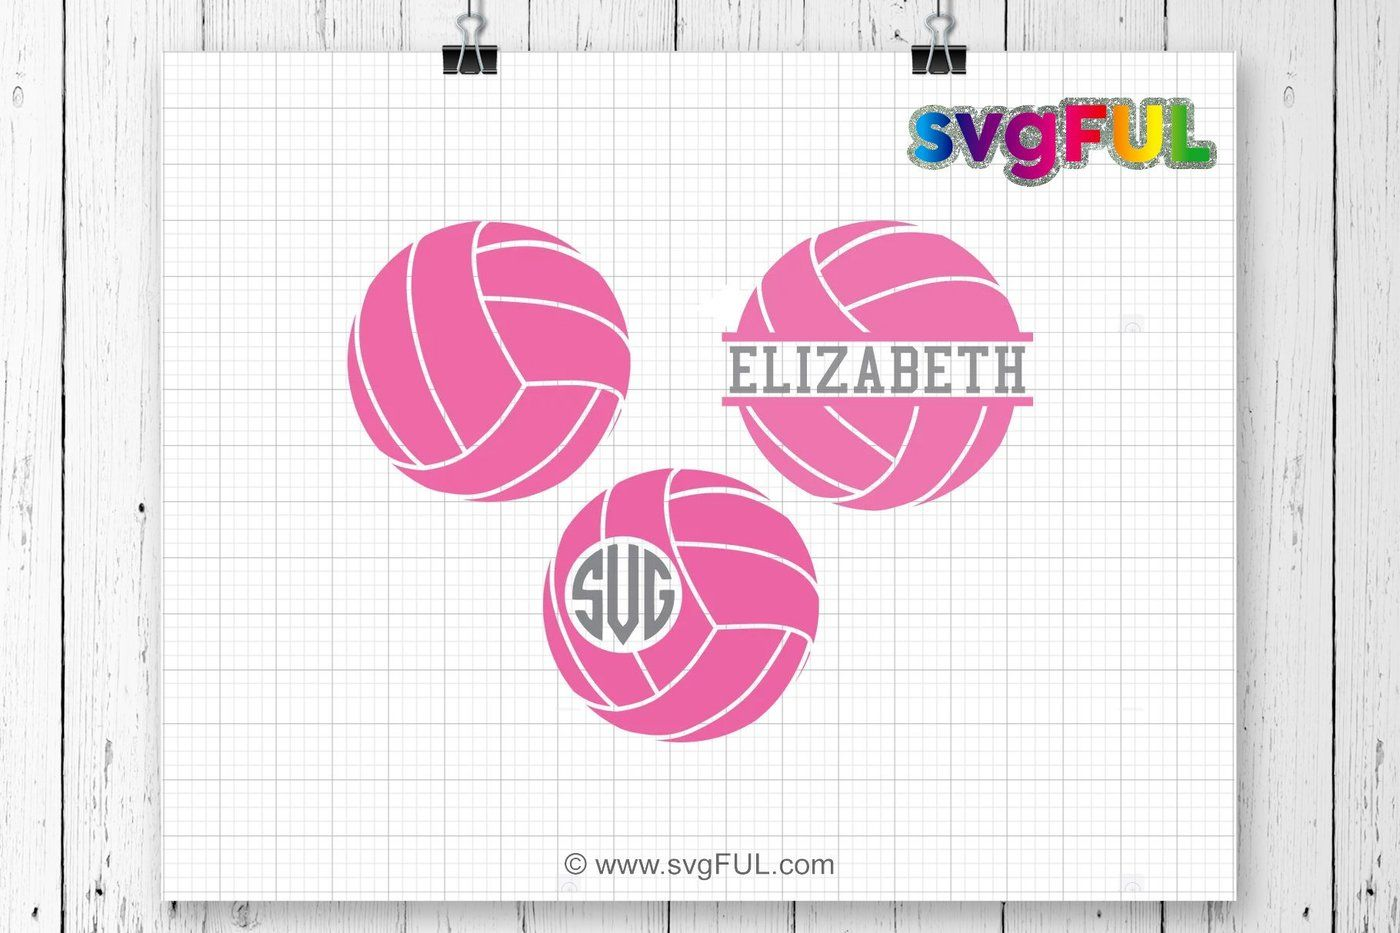 Svg Volleyball Svg Volleyball Frames Svg Volleyball Monogram